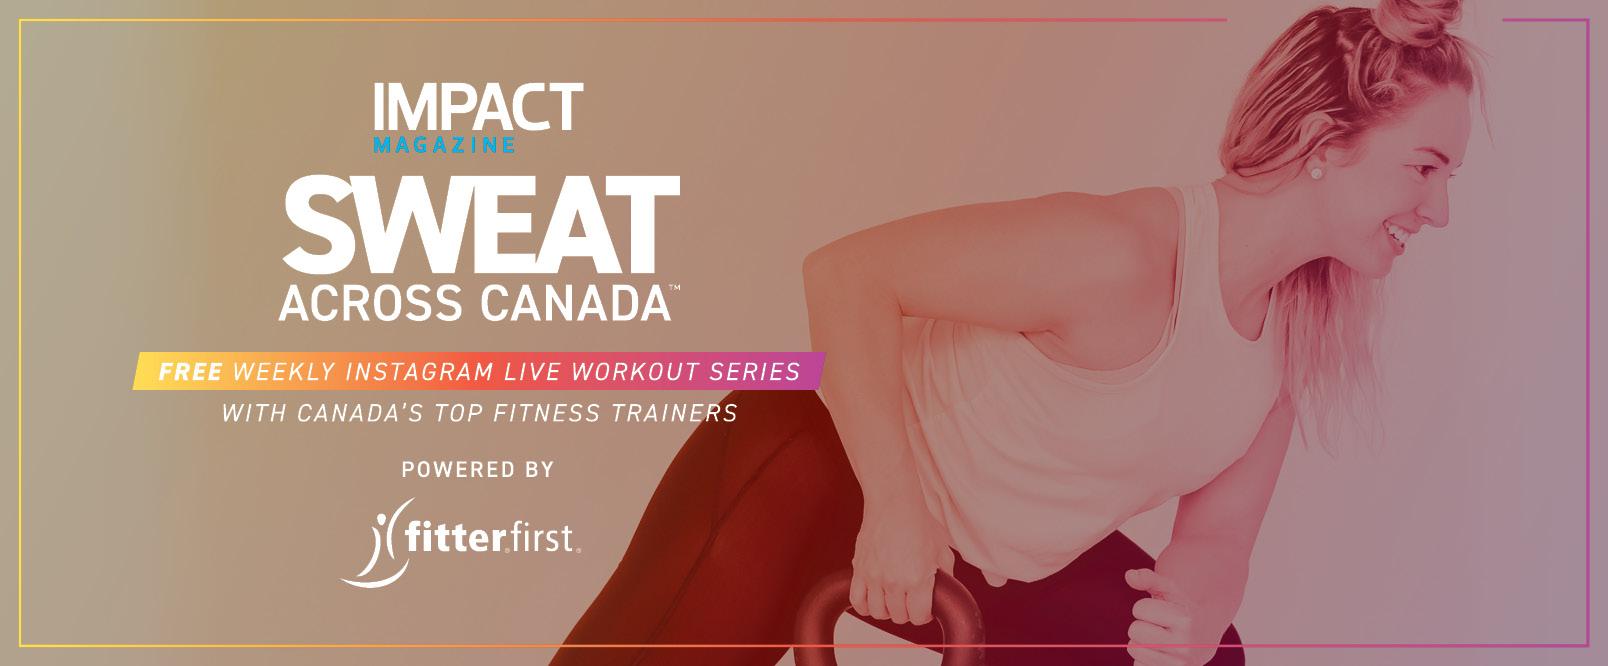 Sweat Accross Canada Banner